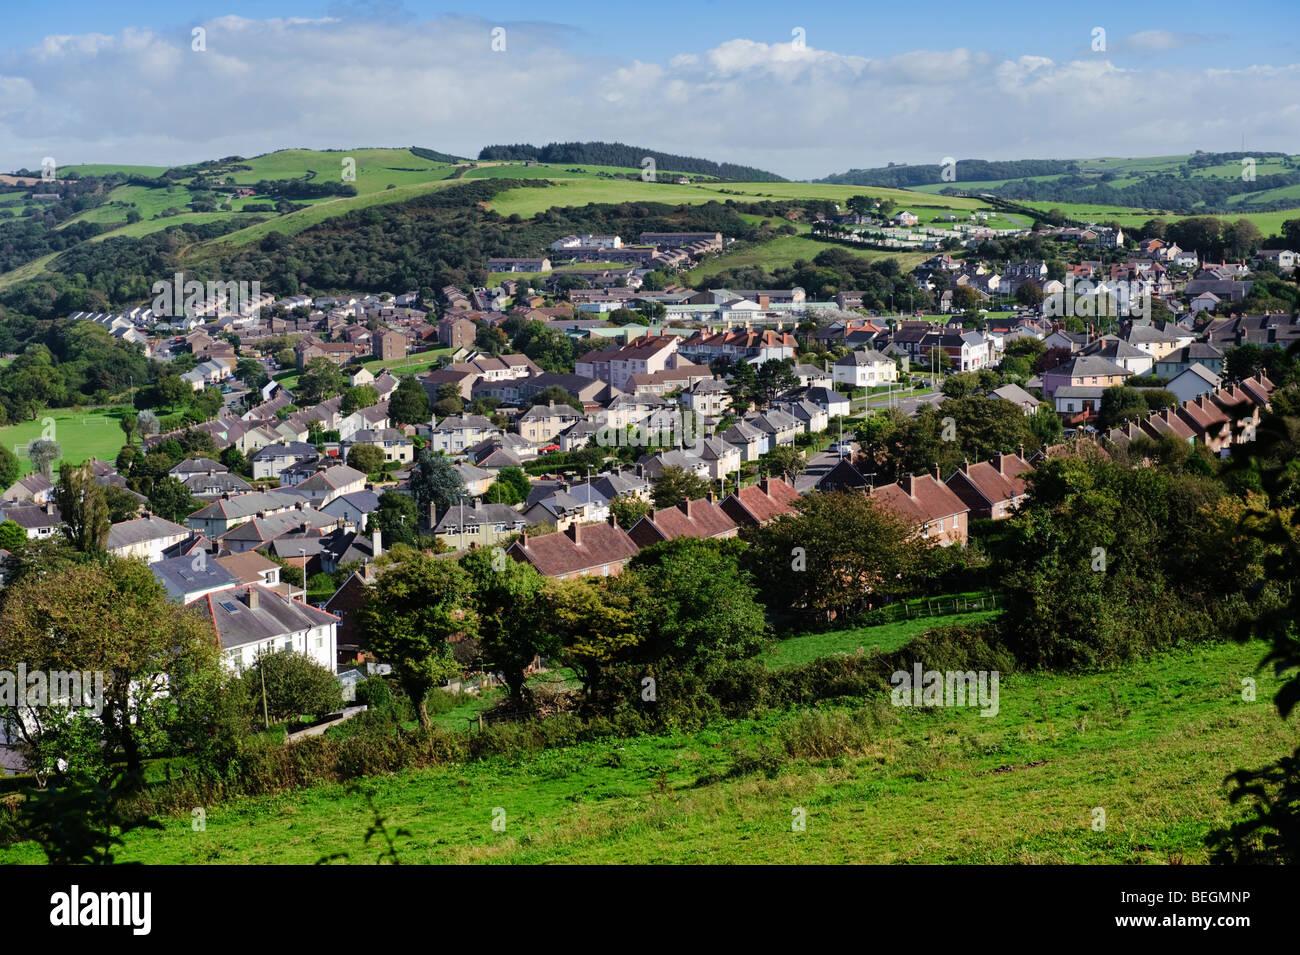 Penparcau council housing estate on the outskirts of Aberystwyth Wales UK - Stock Image